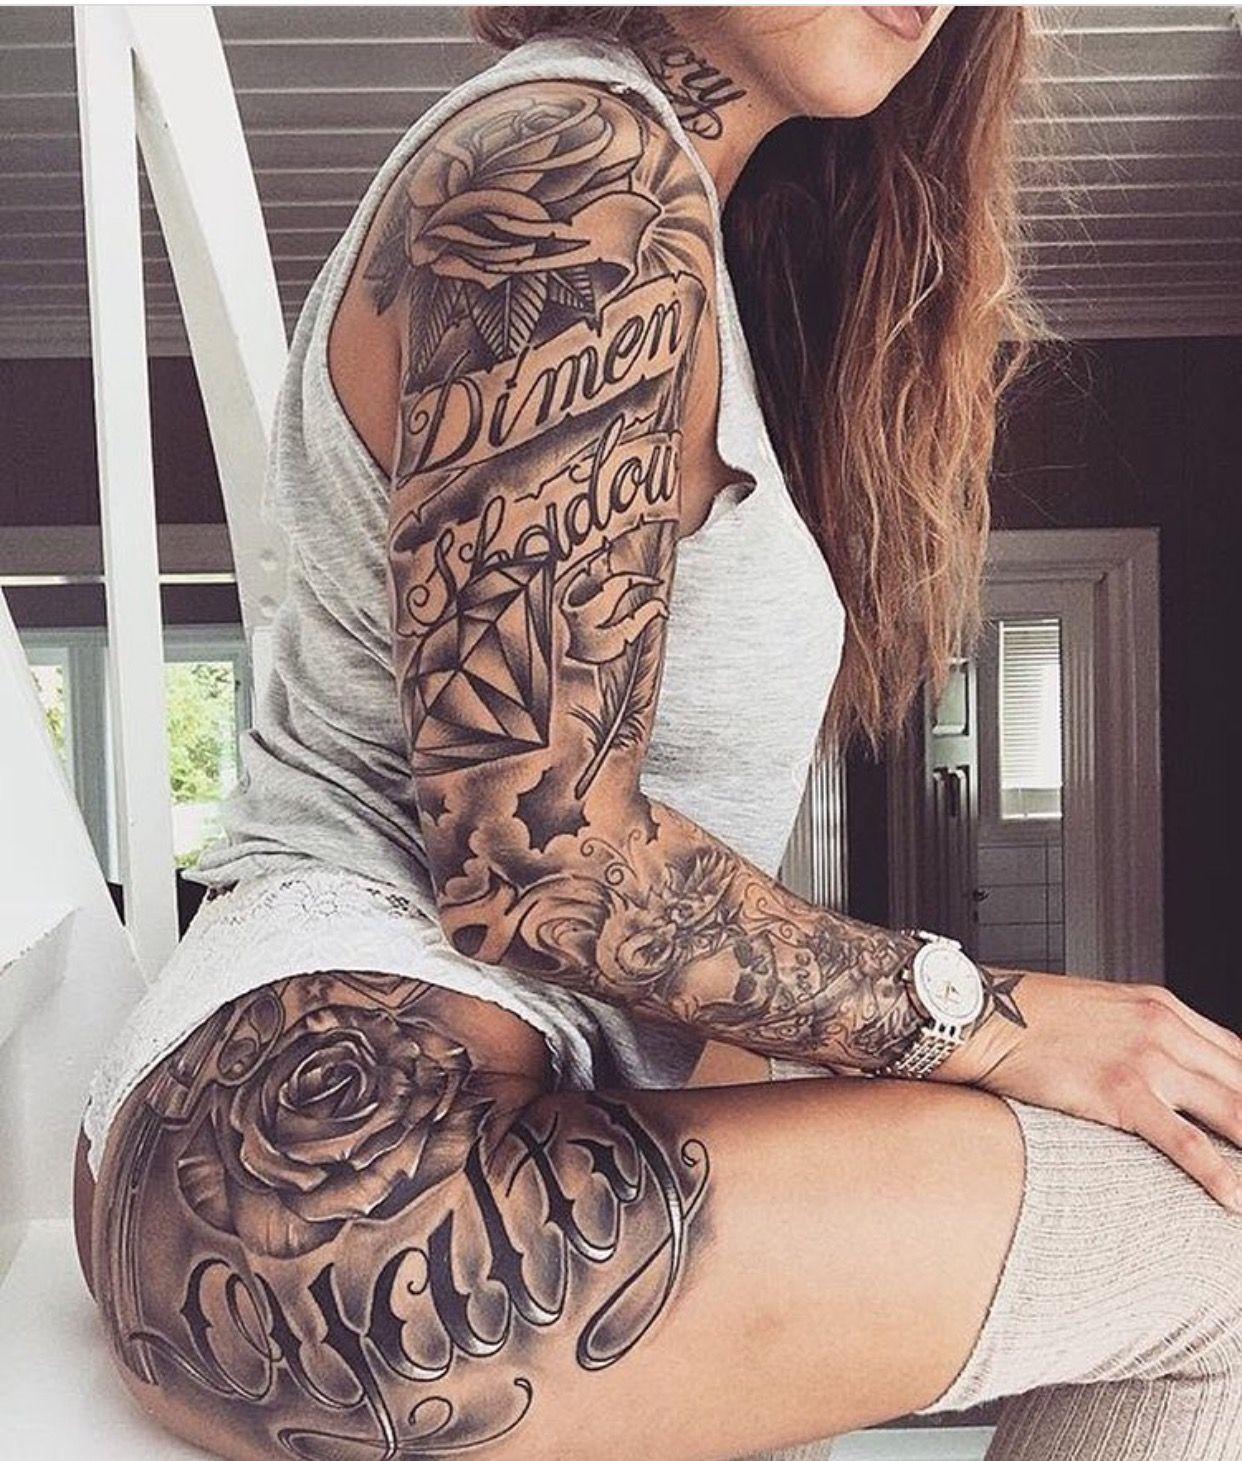 tattoos body girl Real body art Pinterest Tattoos Body Art